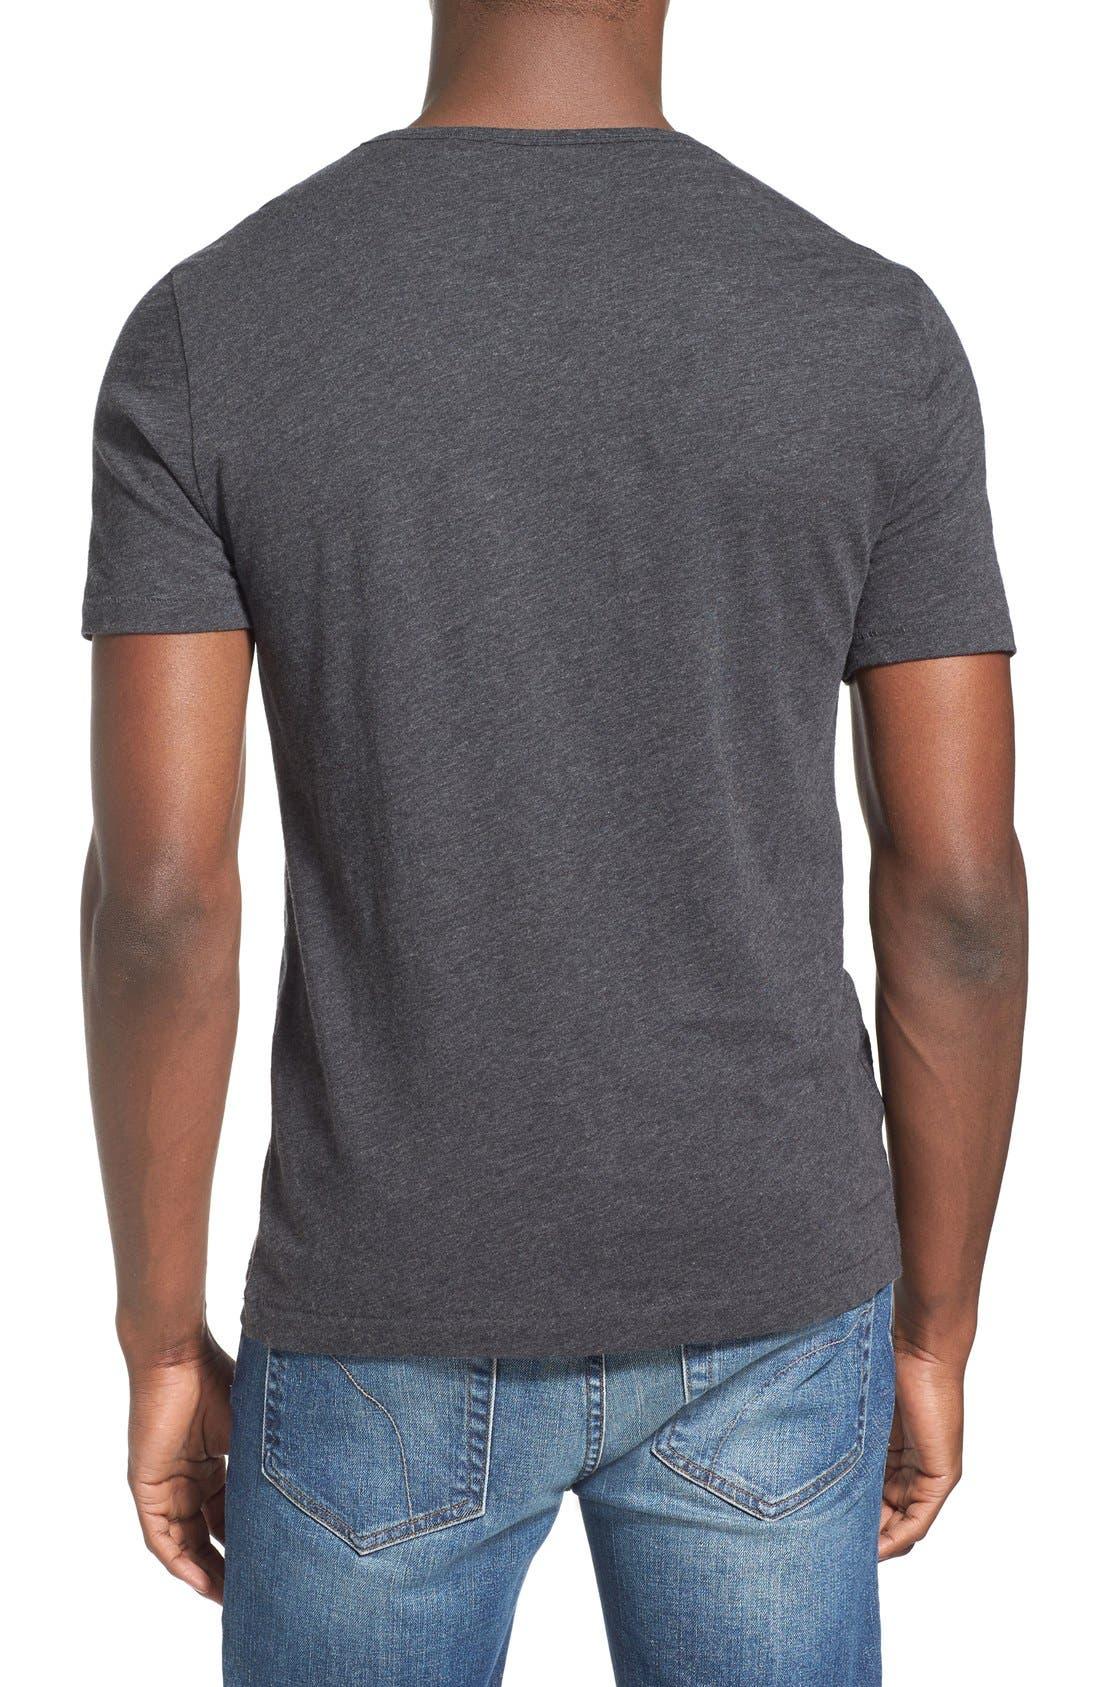 'Bing' V-Neck Pocket T-Shirt,                             Alternate thumbnail 2, color,                             Dark Charcoal Heather